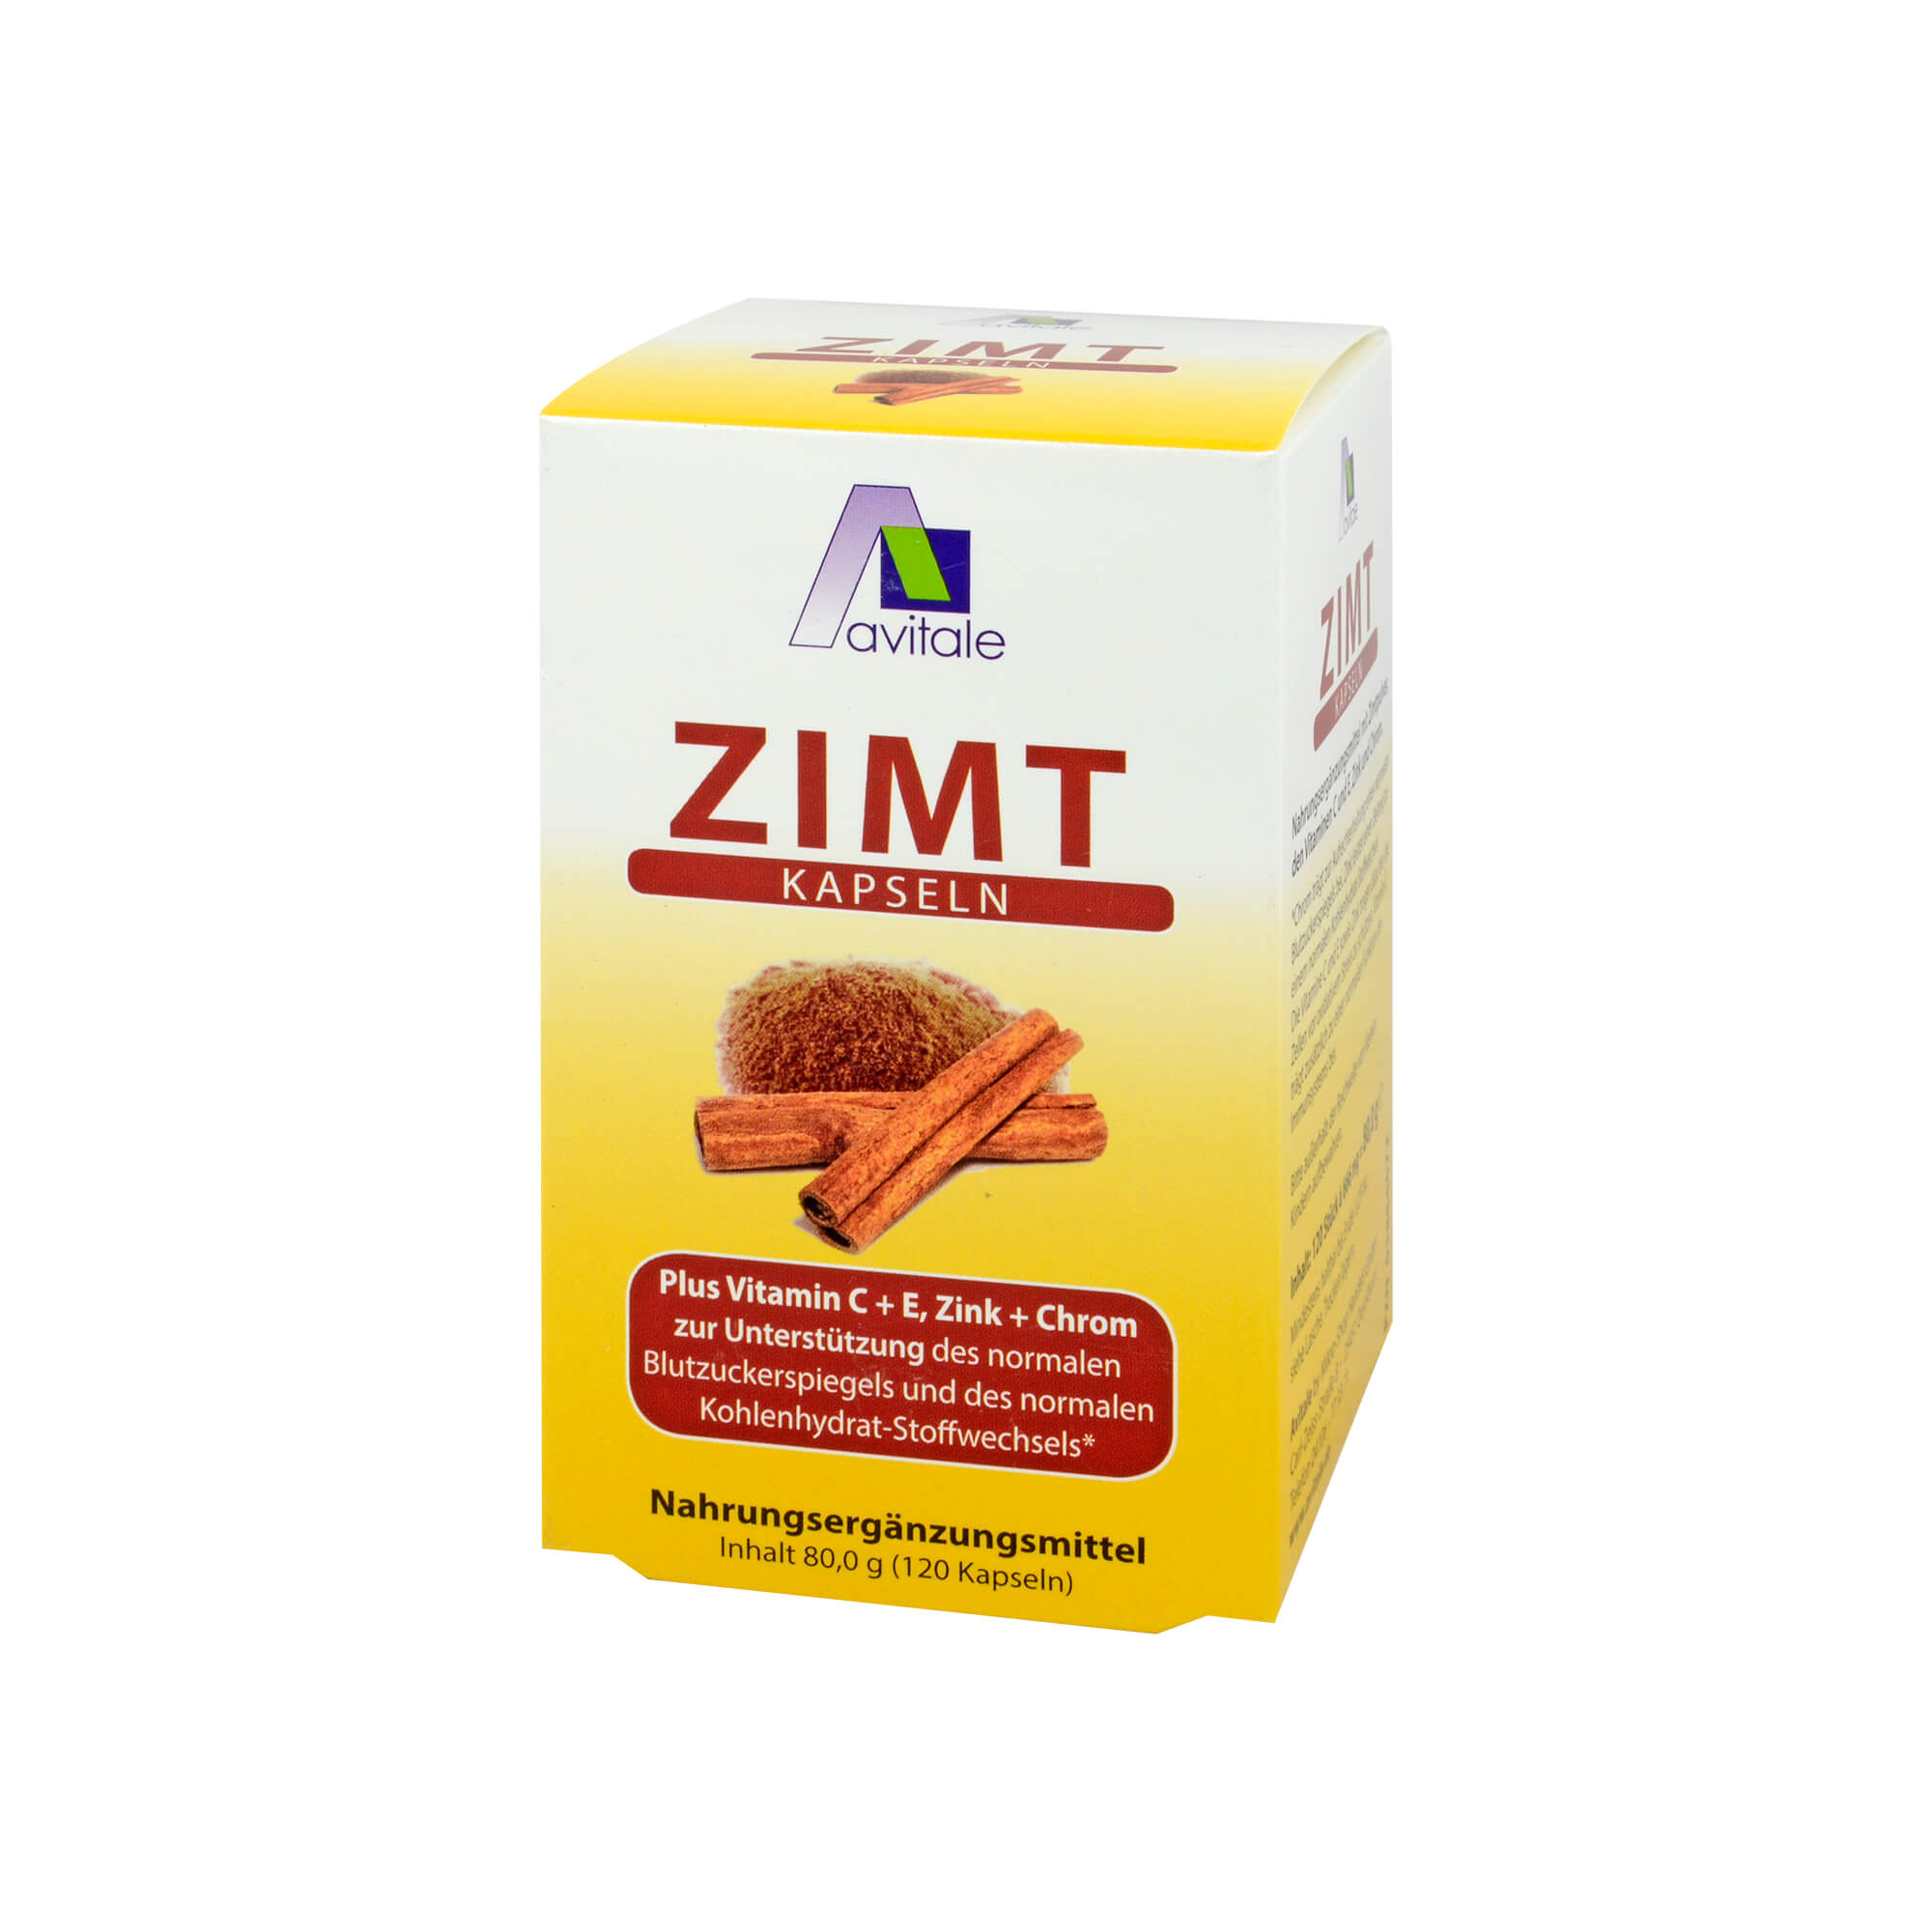 Zimtkapseln 500mg + Vitamin C+E